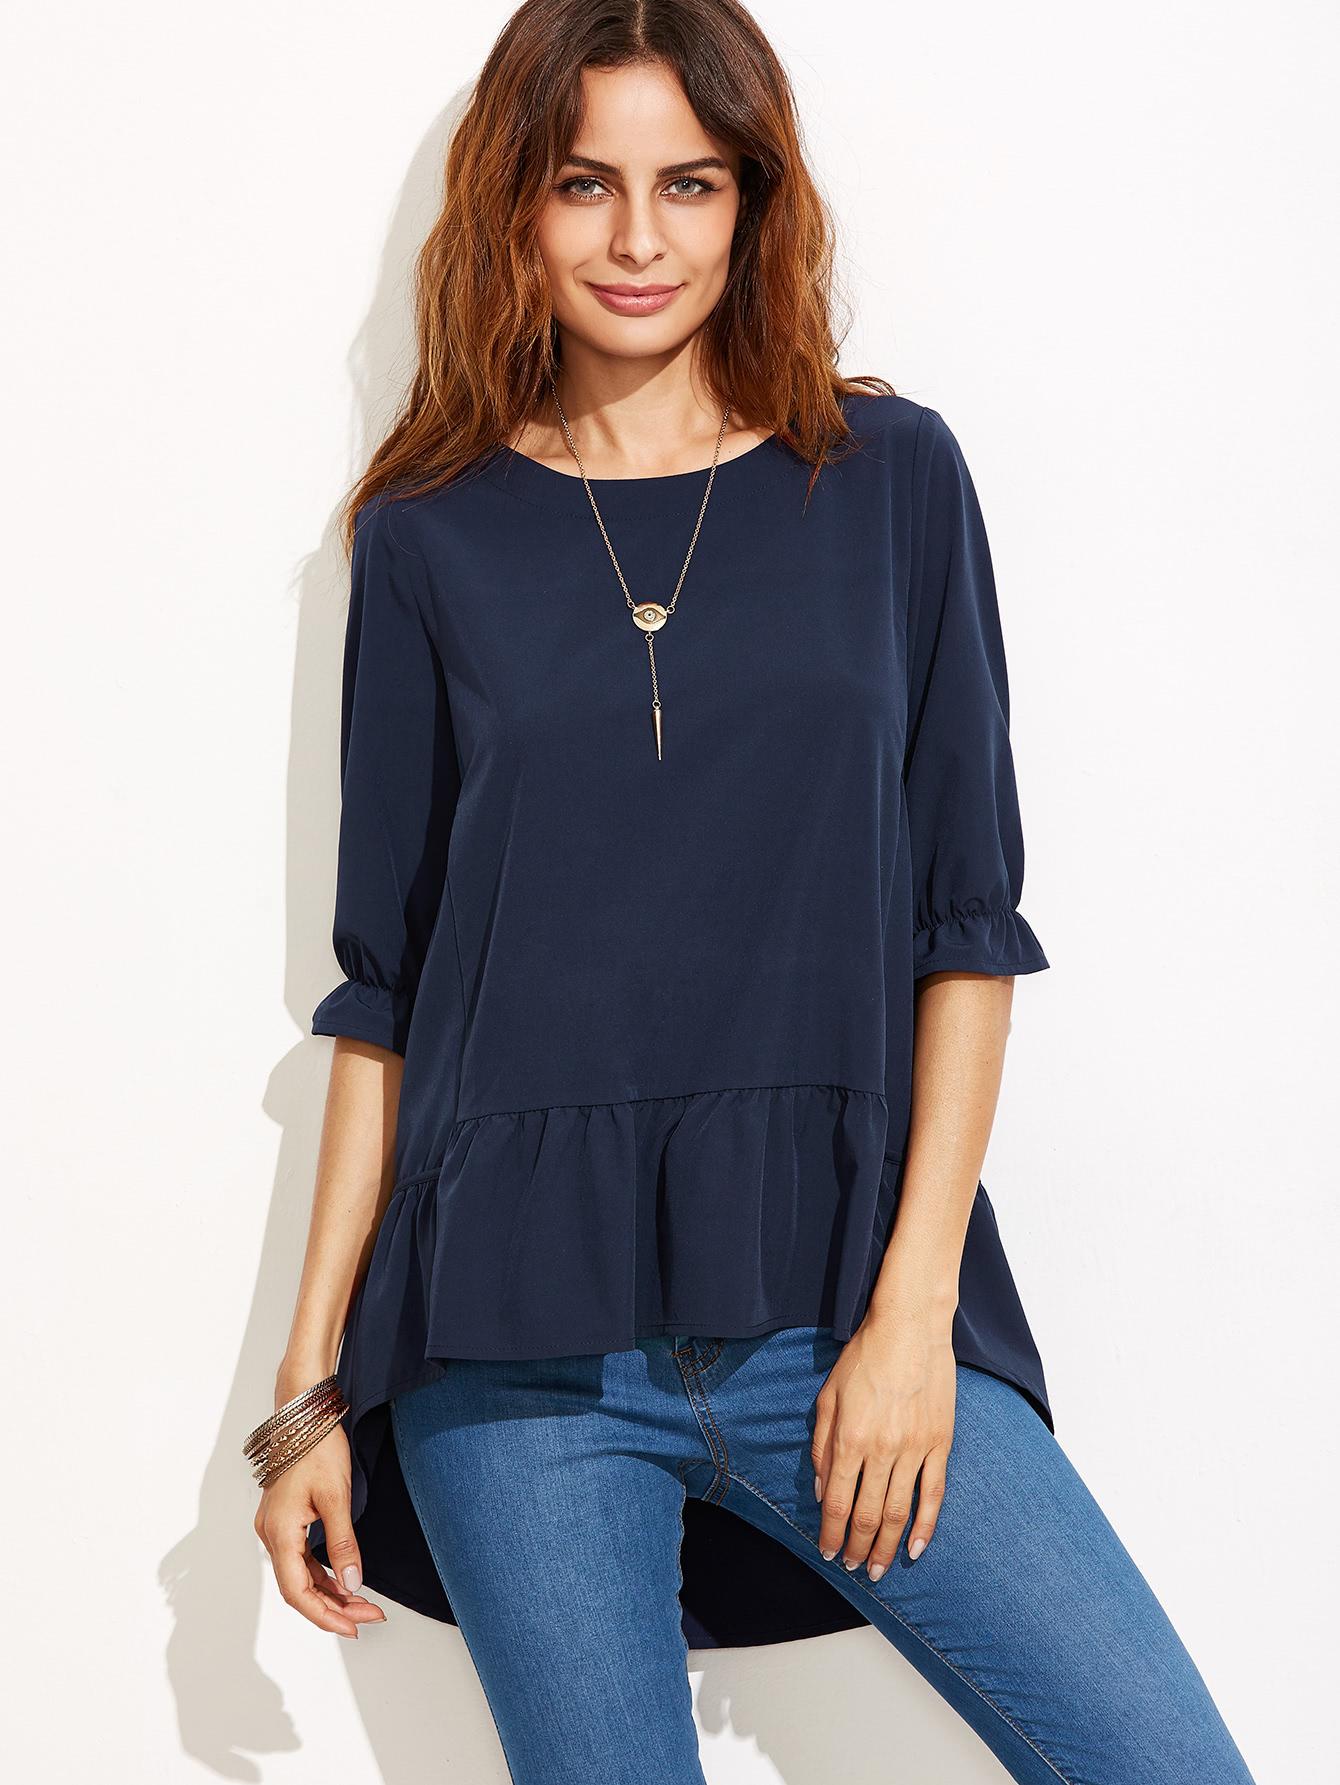 blouse160905701_2